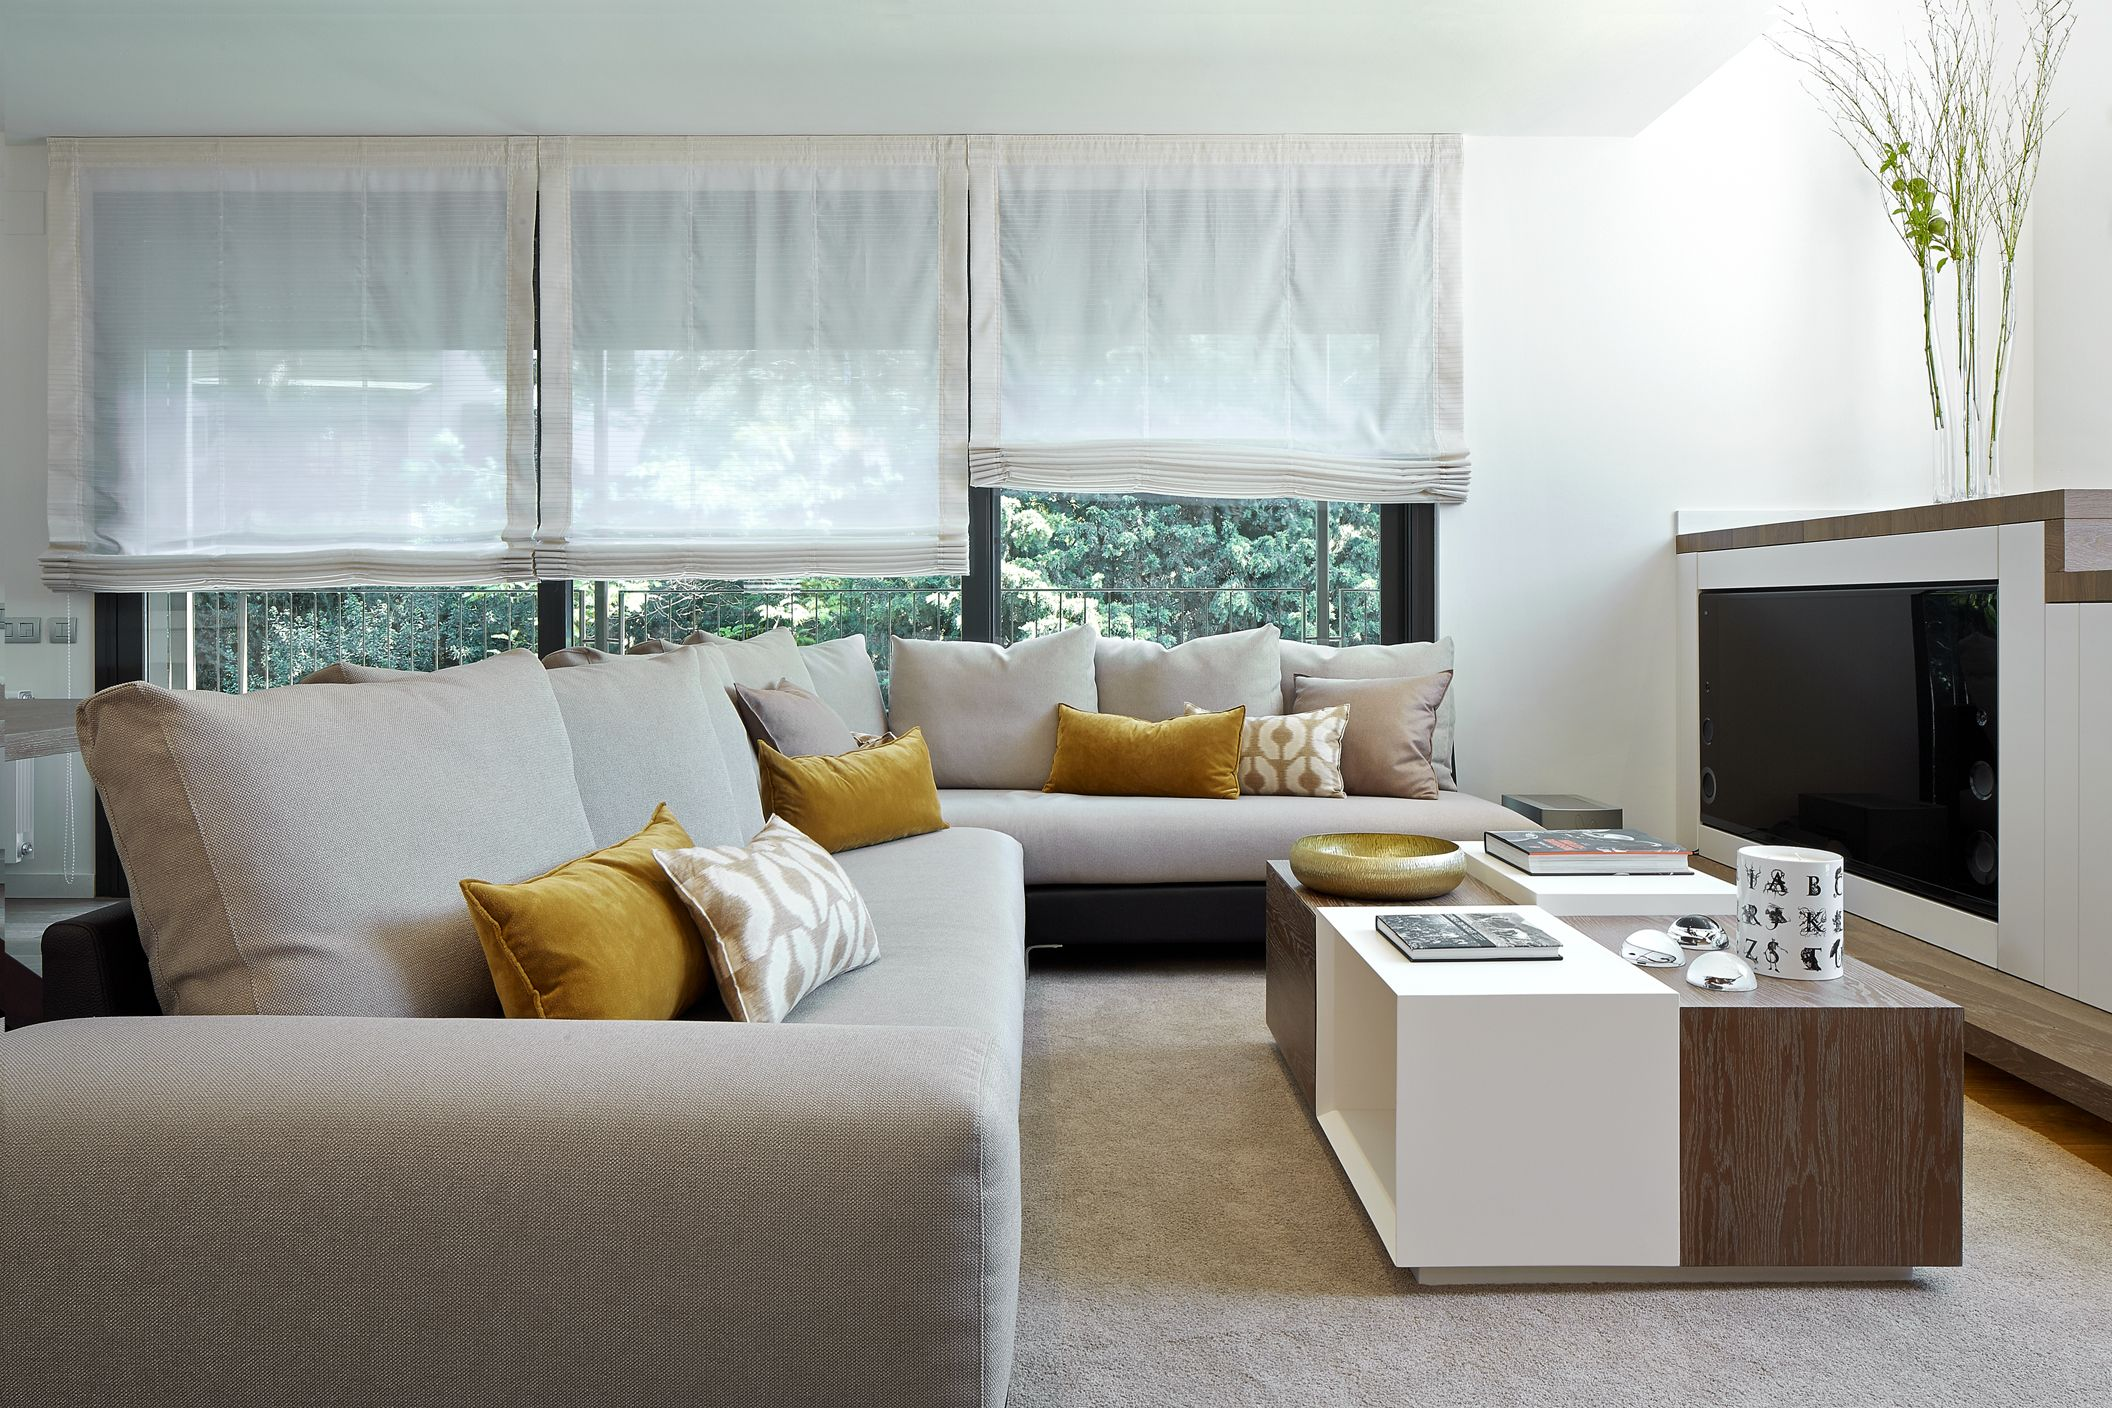 molins interiors interior decoracin saln sof sof